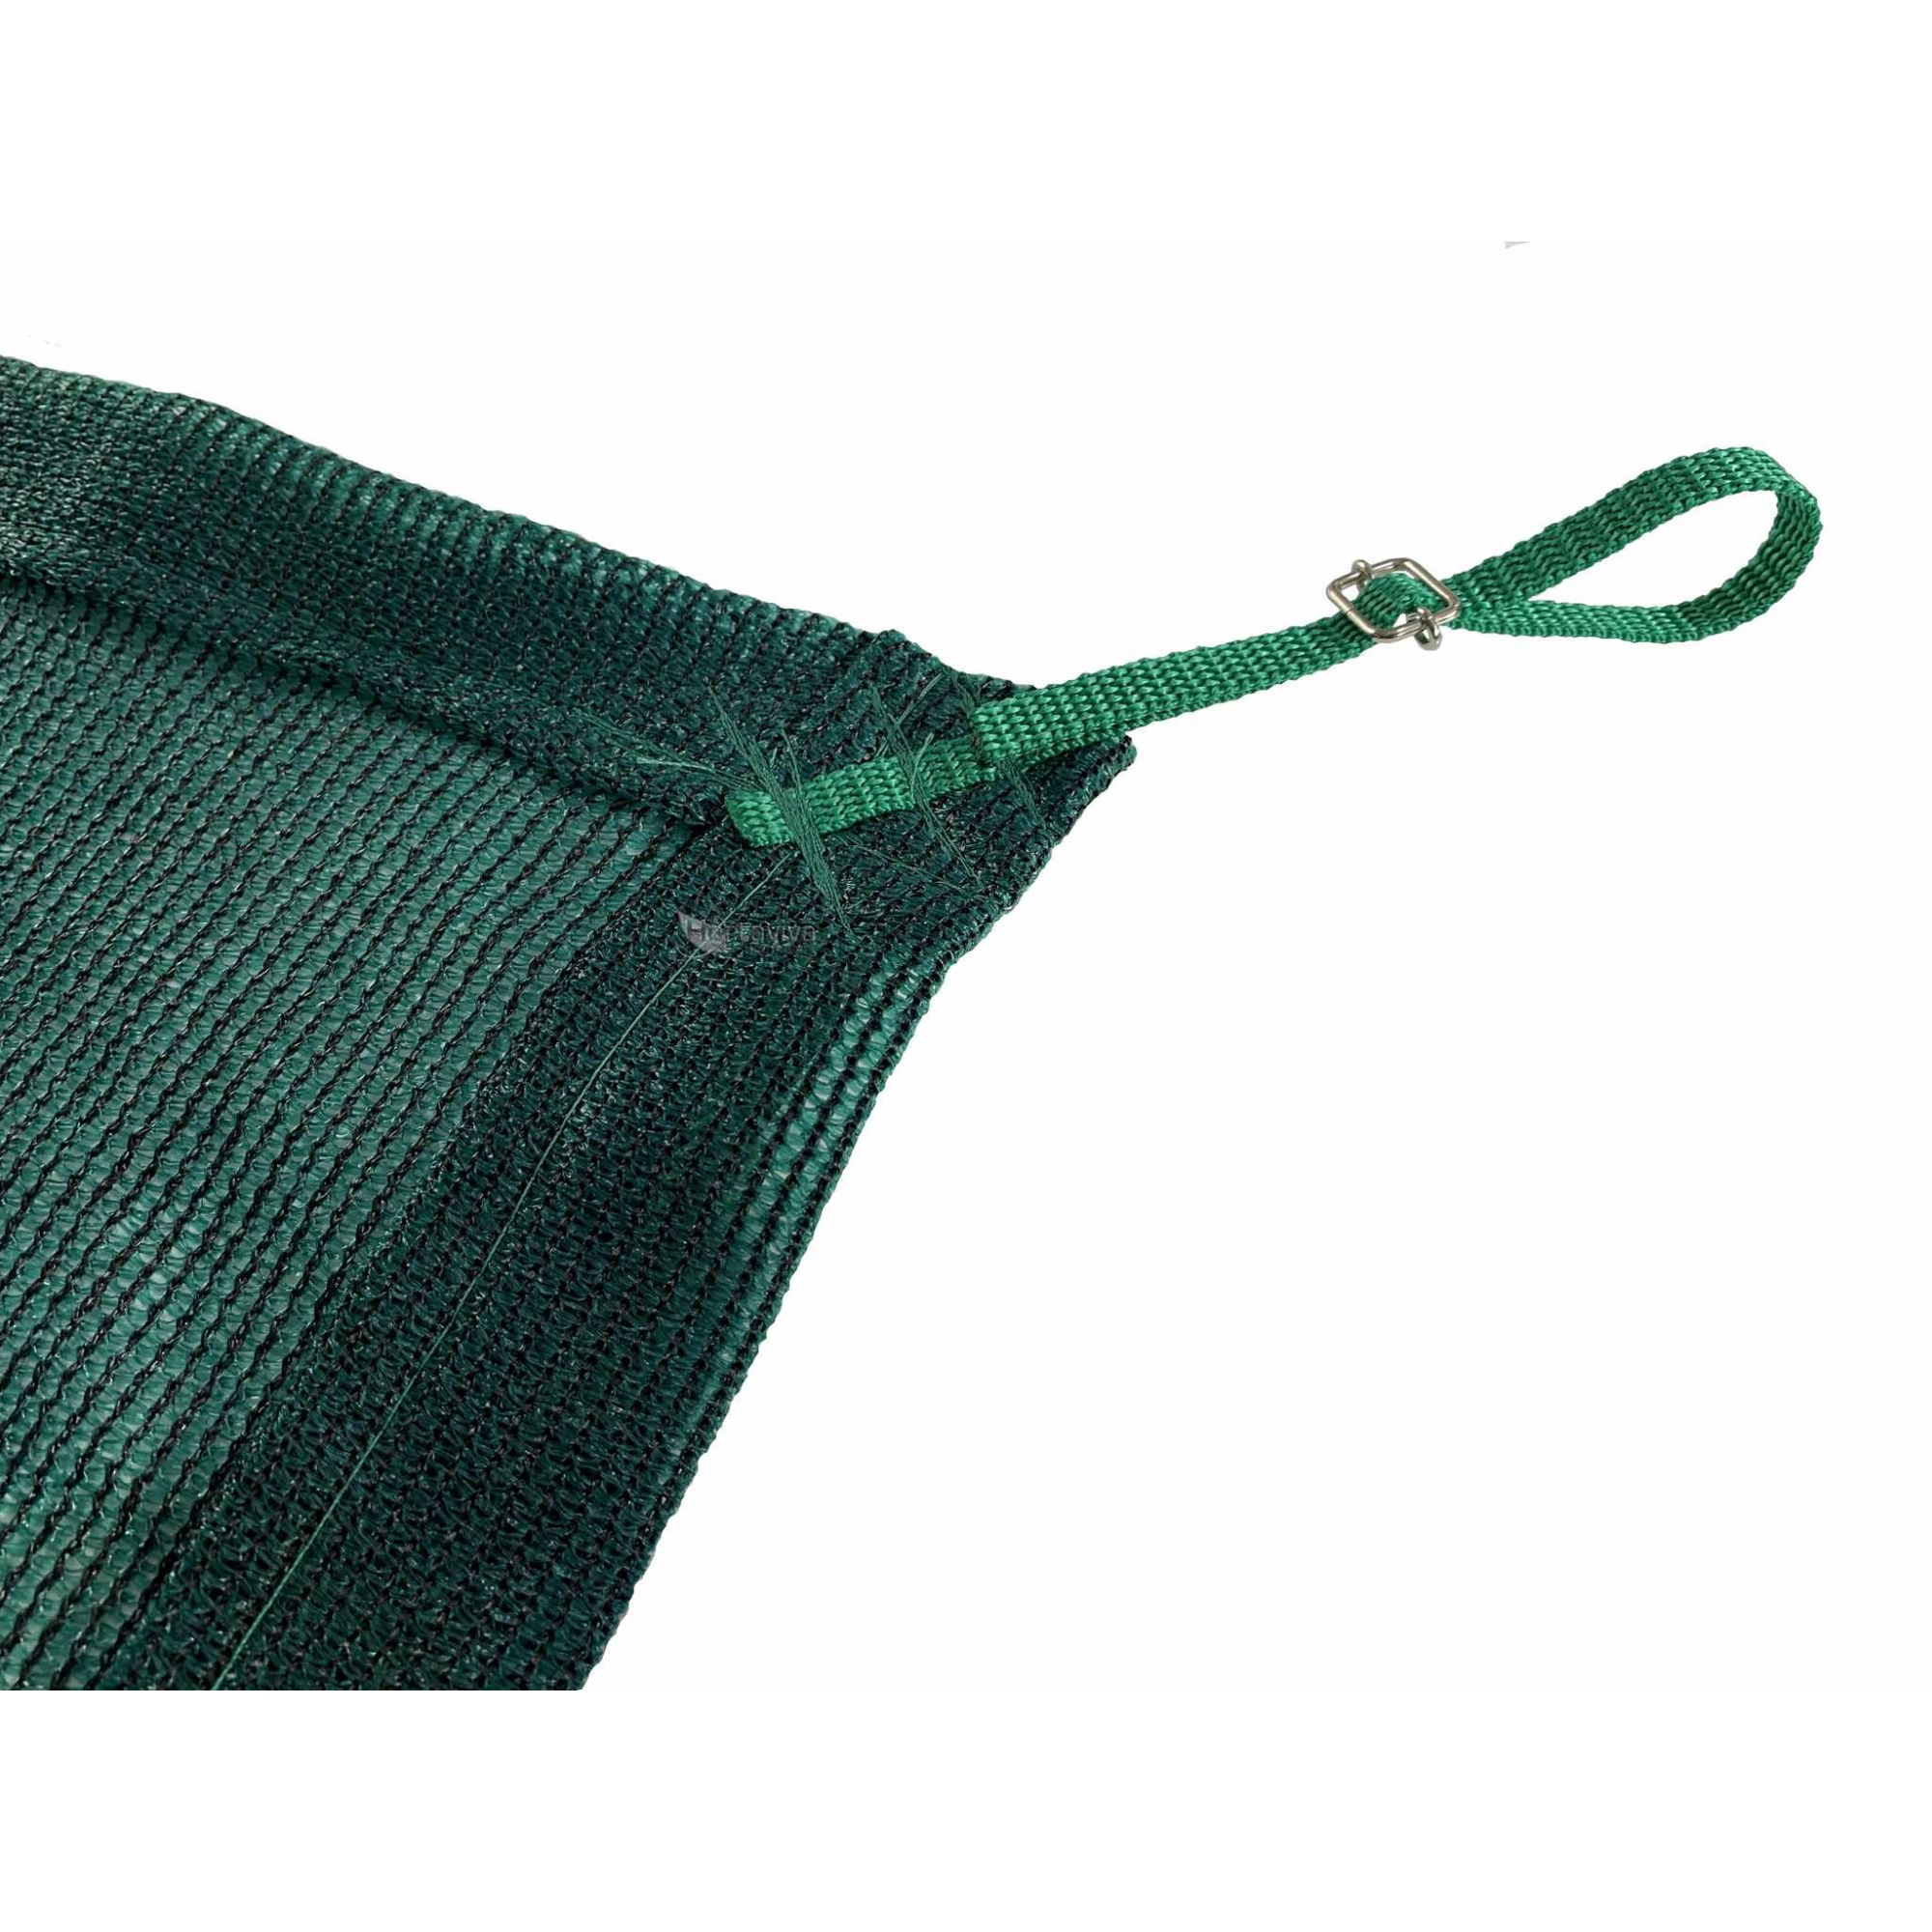 Tela de Sombreamento 80% Verde com Esticadores - Largura: 2,8 Metros